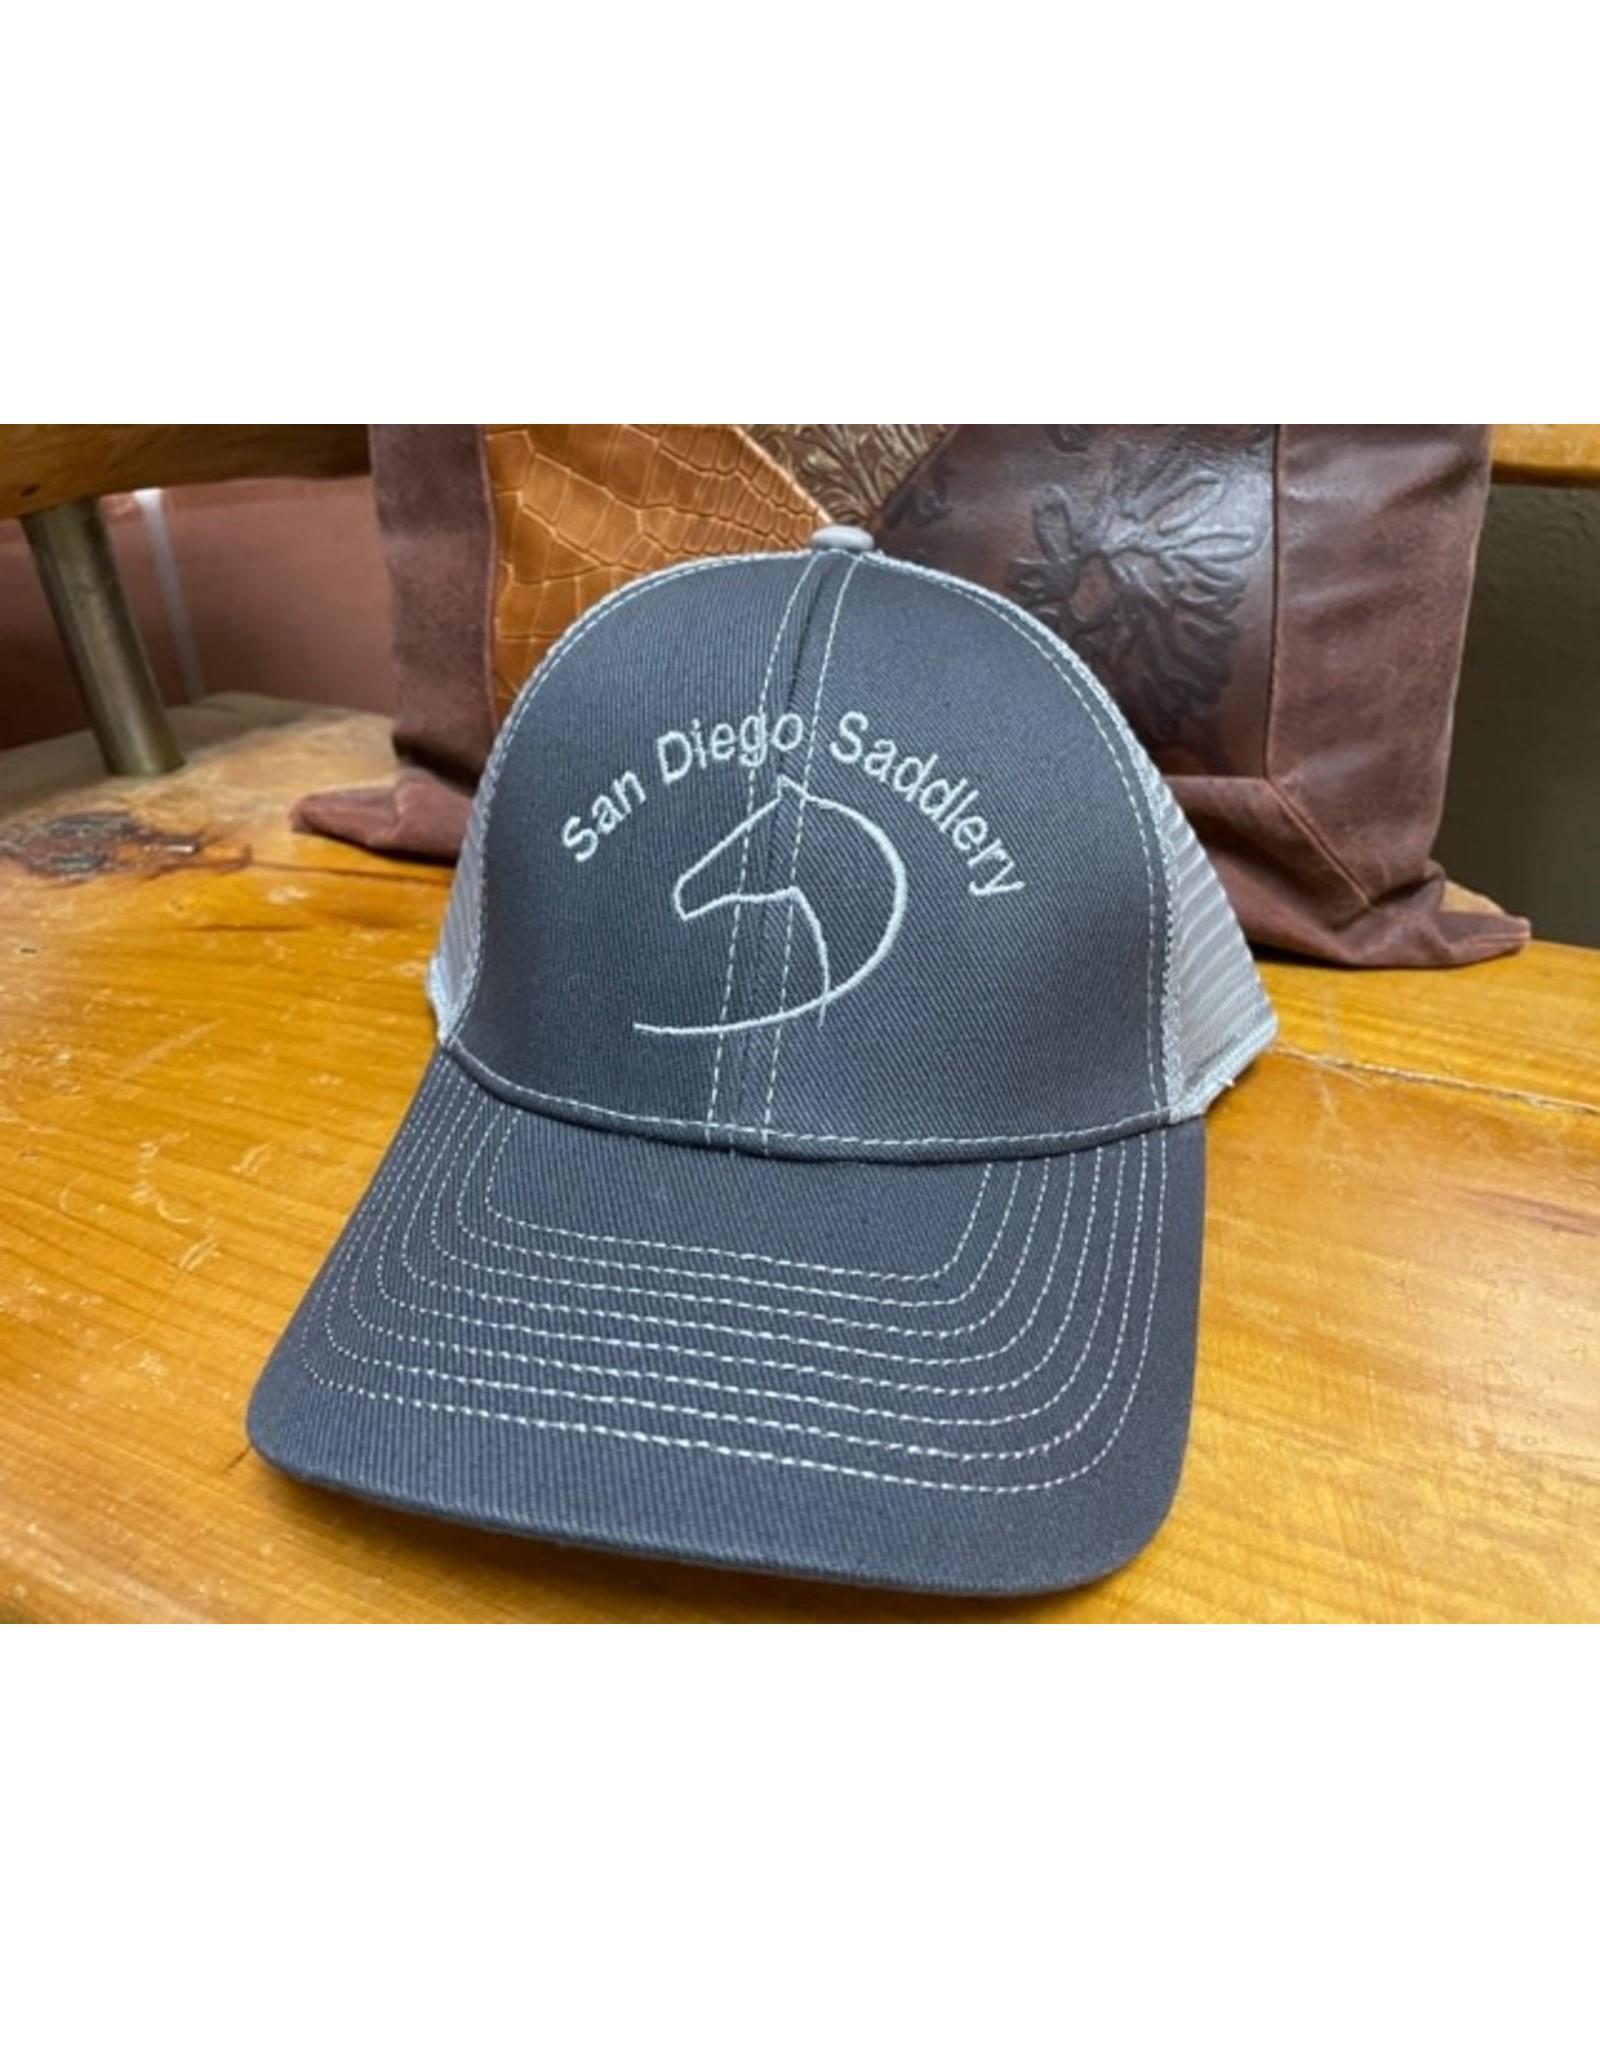 Trucker Style Cap San Diego Saddlery